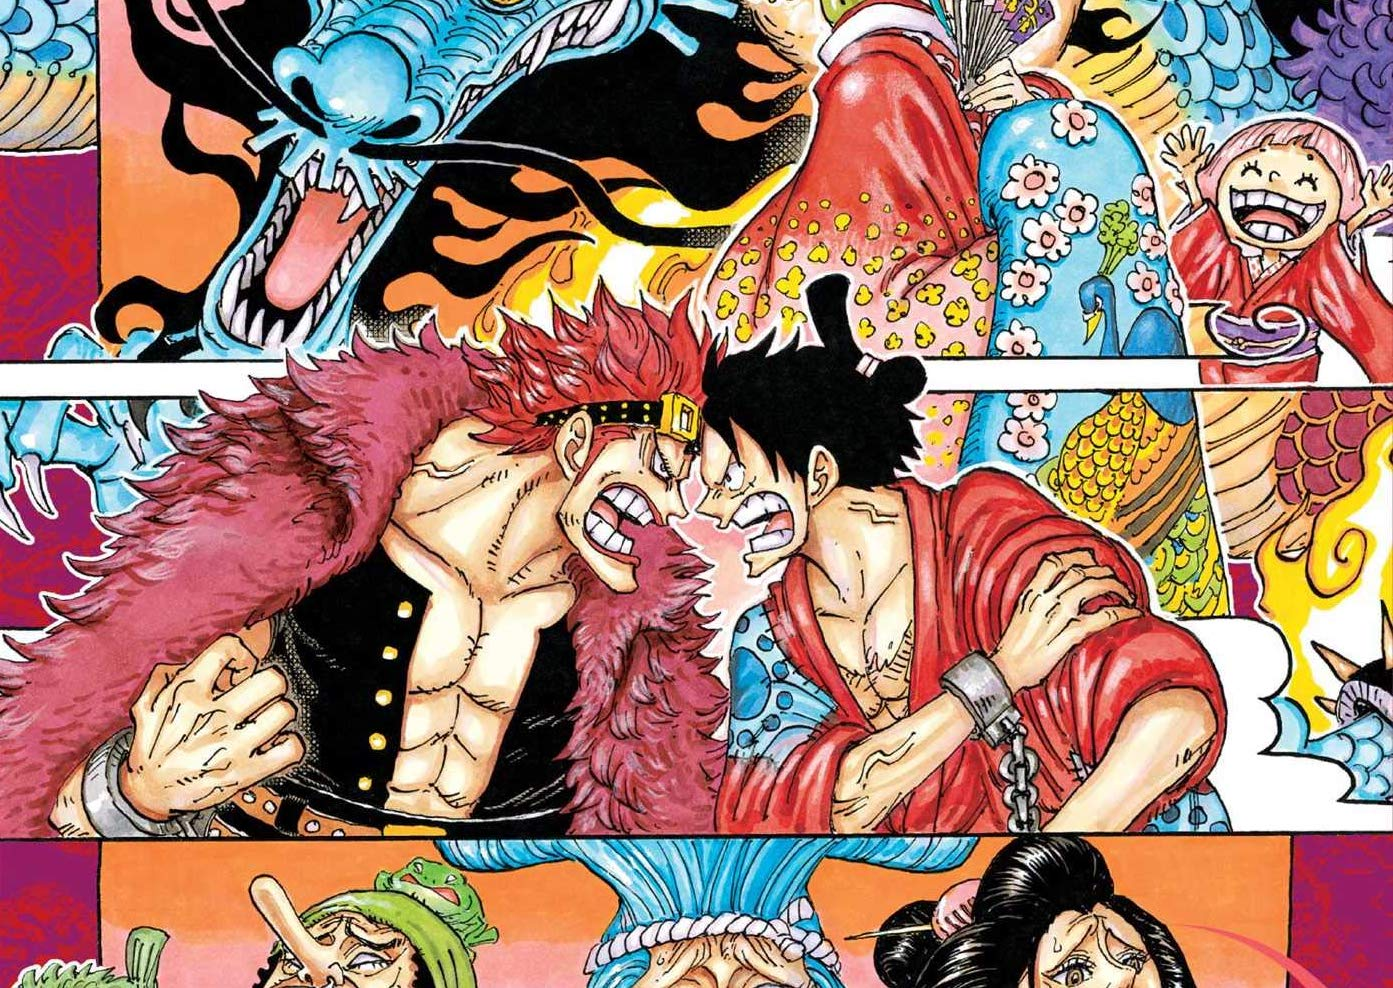 One Piece Vol. 92: Introducing Komurasaki the Oiran Review